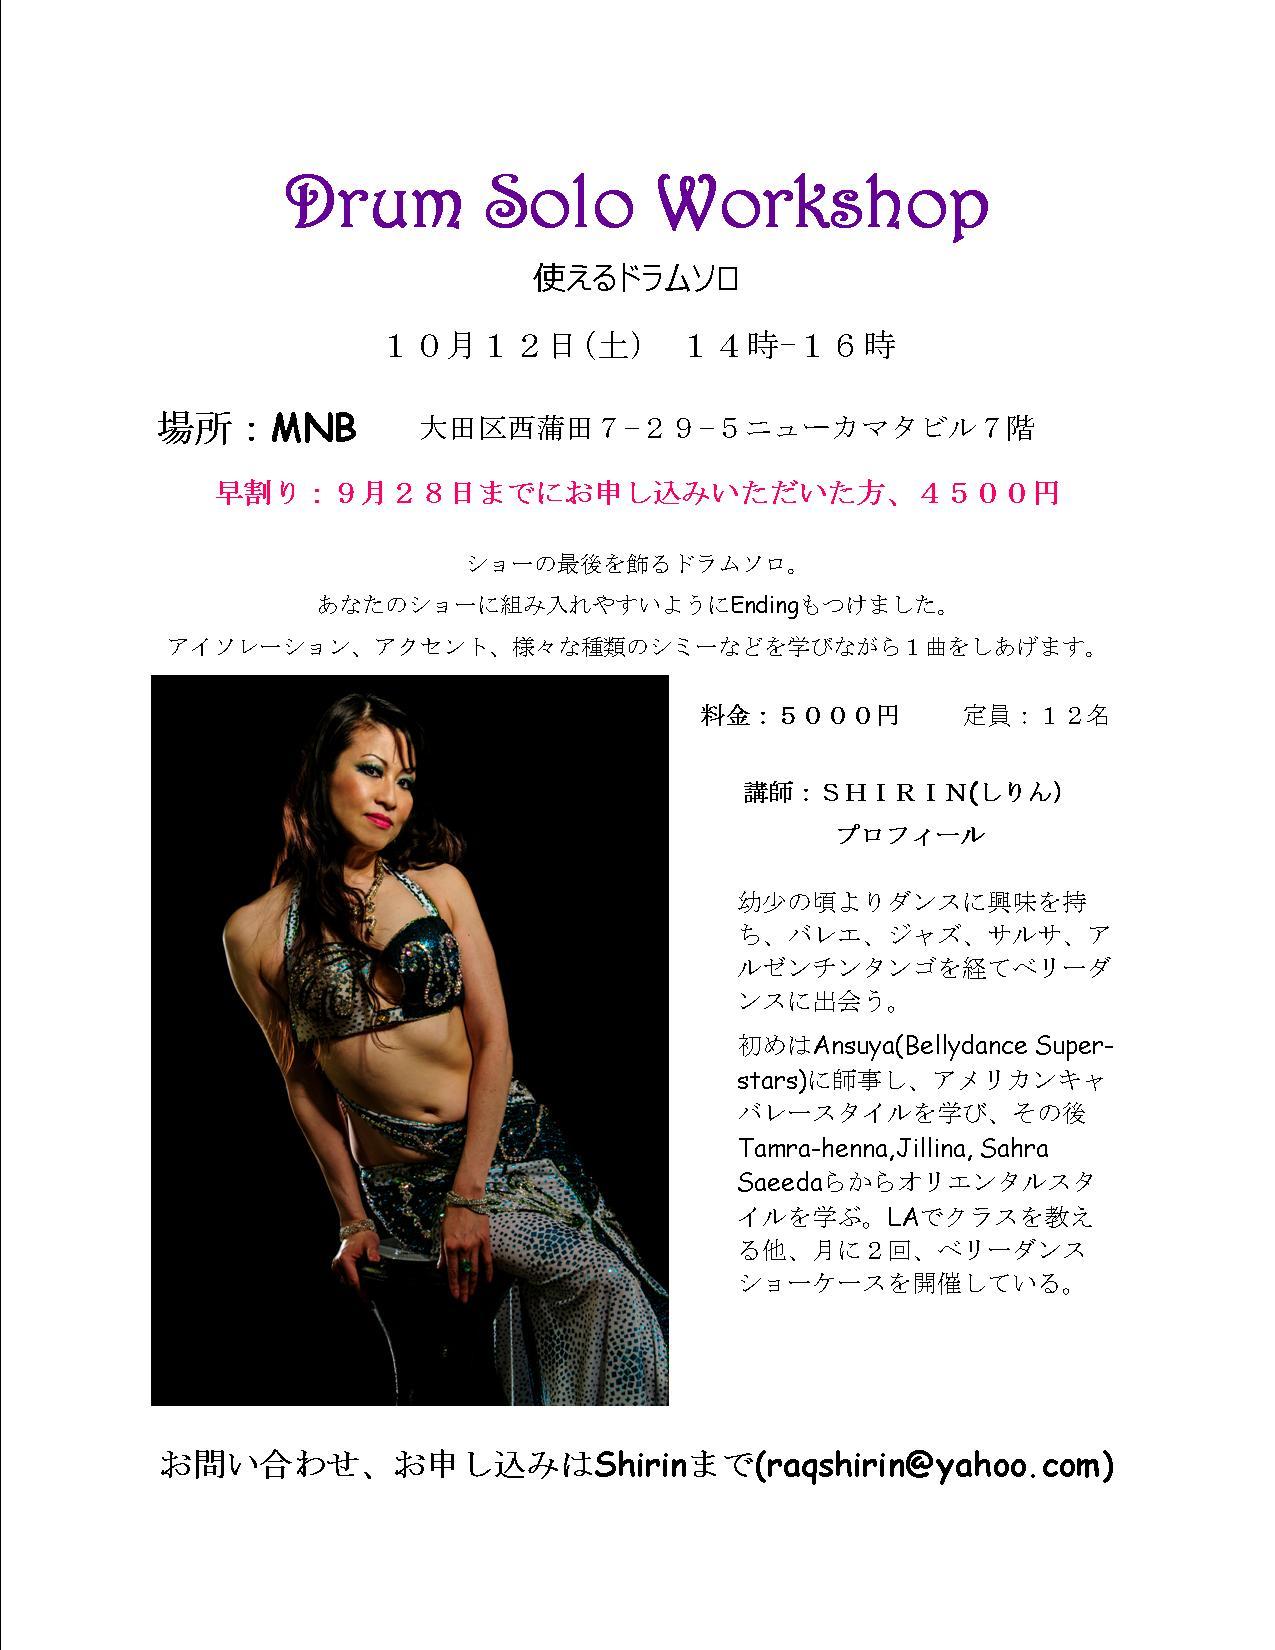 DrumSololWorkshop@MNB - Copy